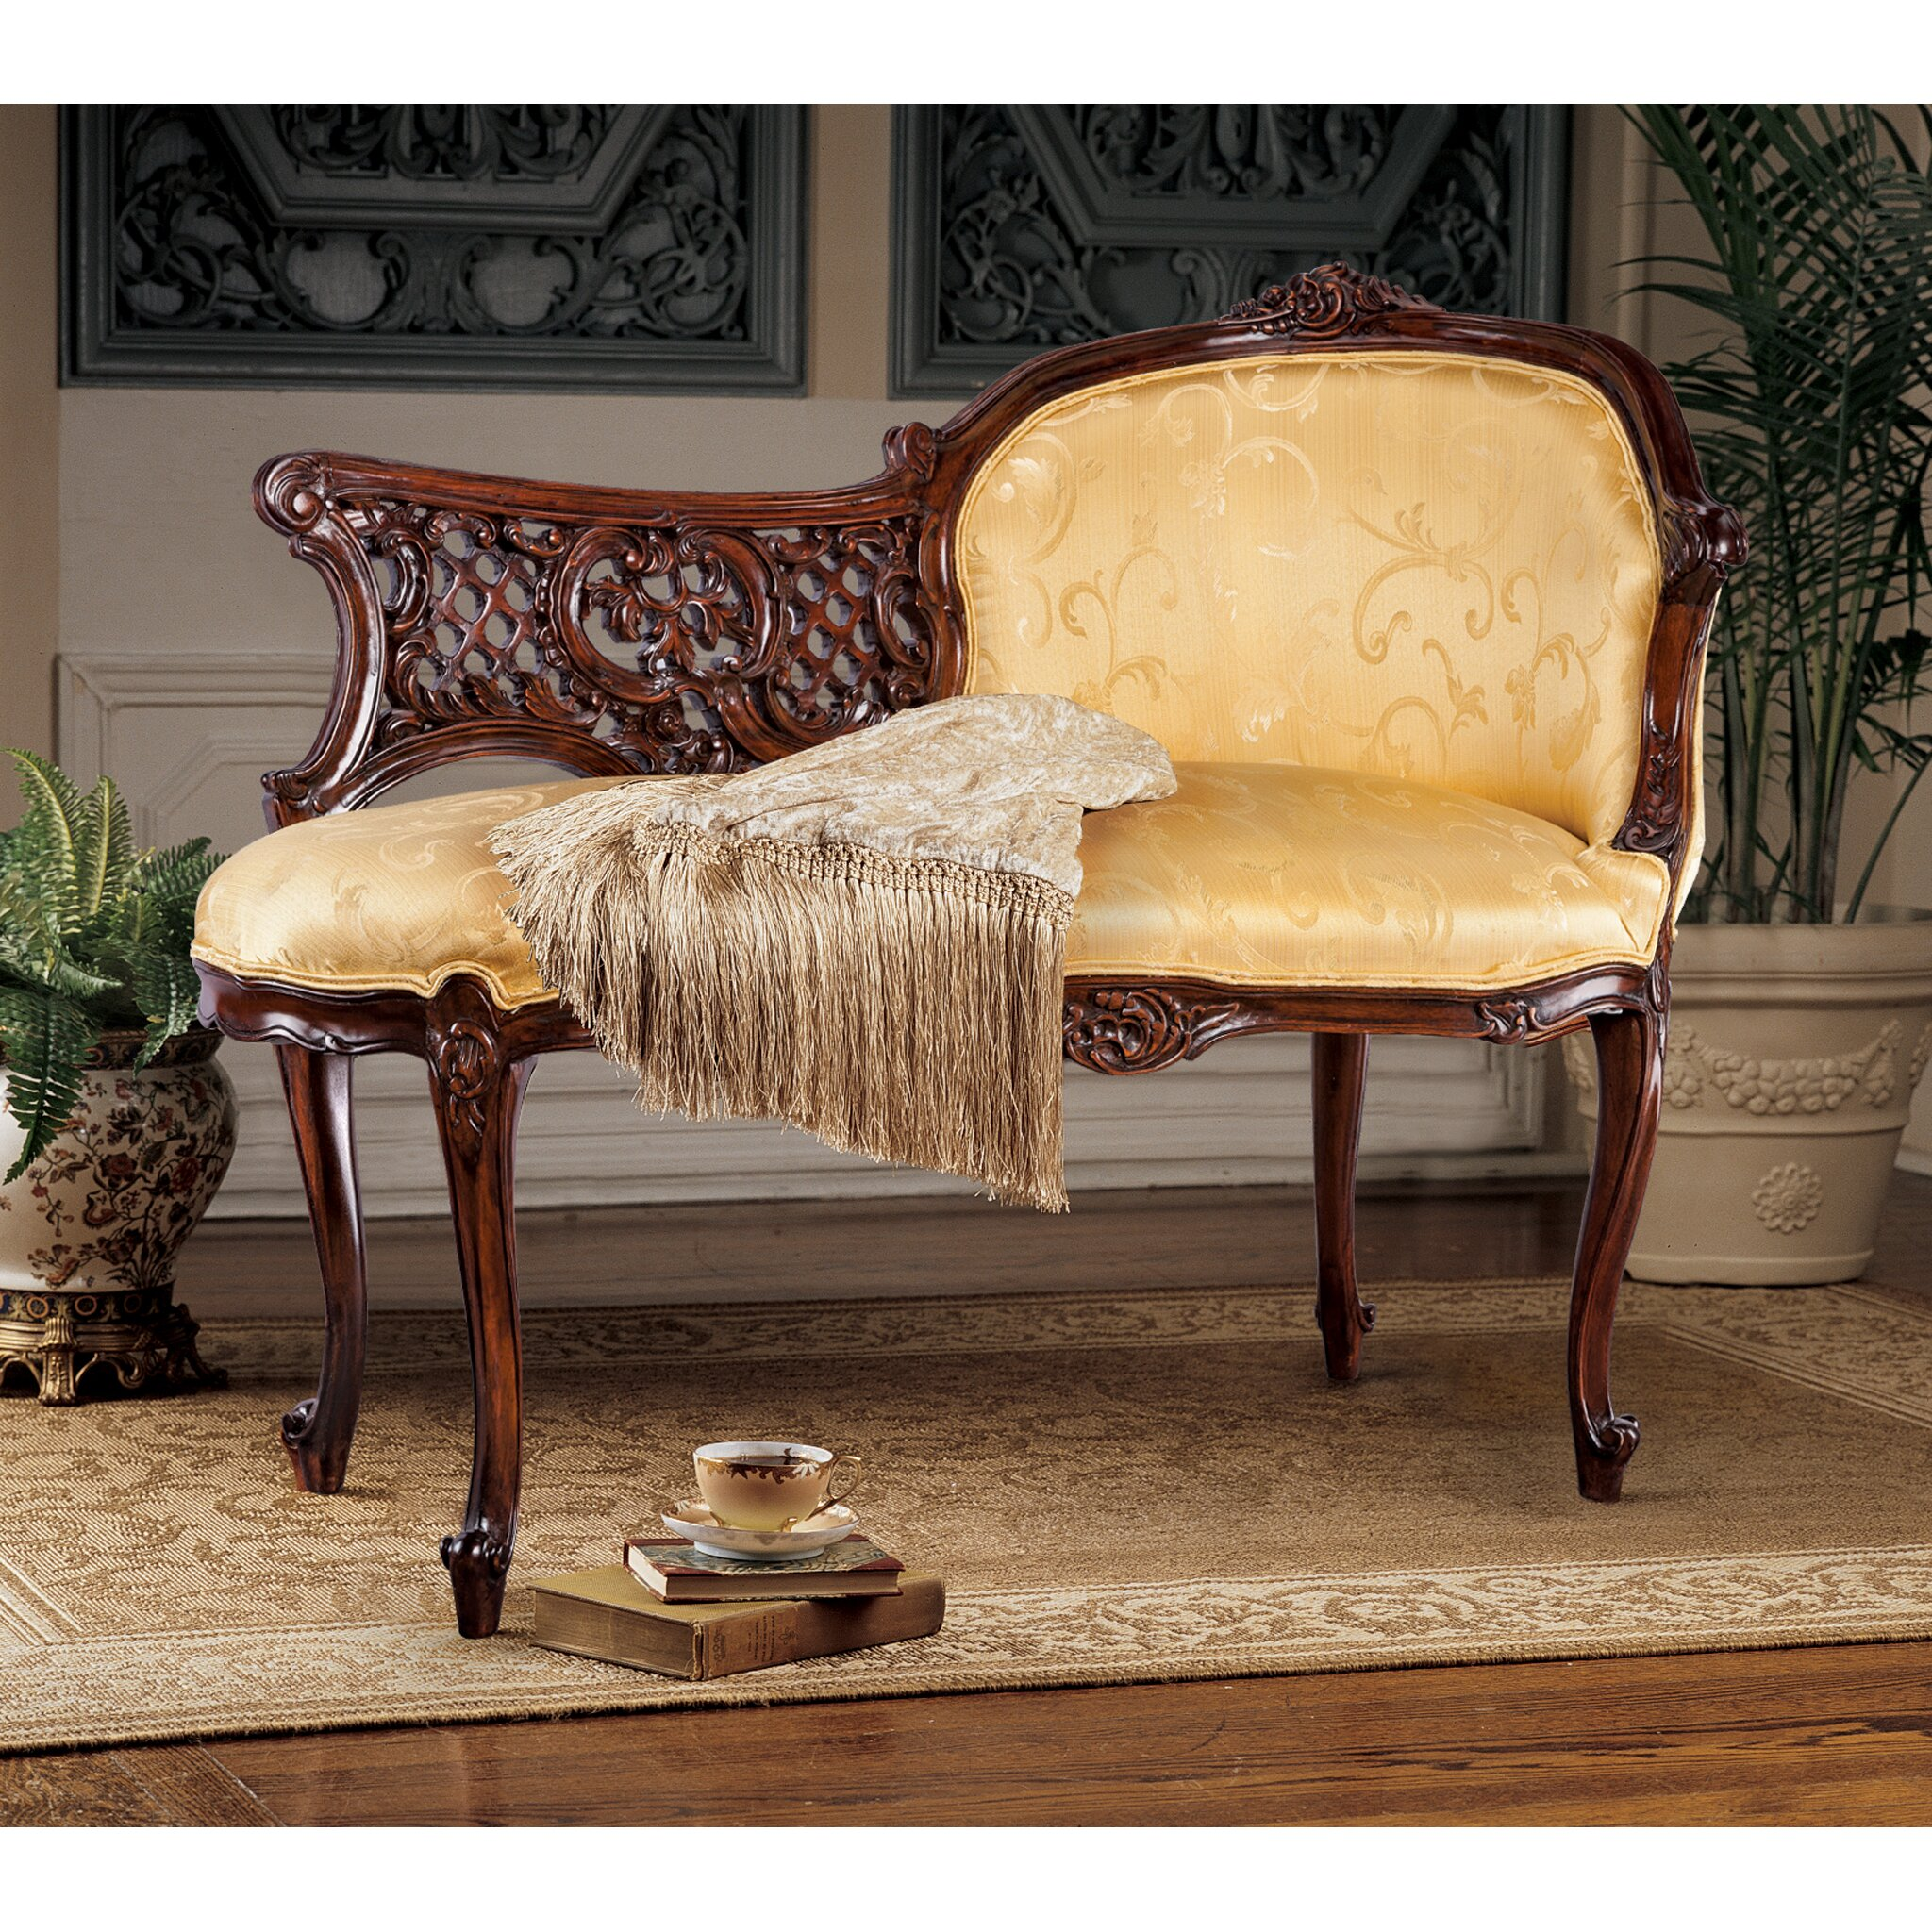 Design Toscano Madame Fabric Chaise Lounge & Reviews   Wayfair